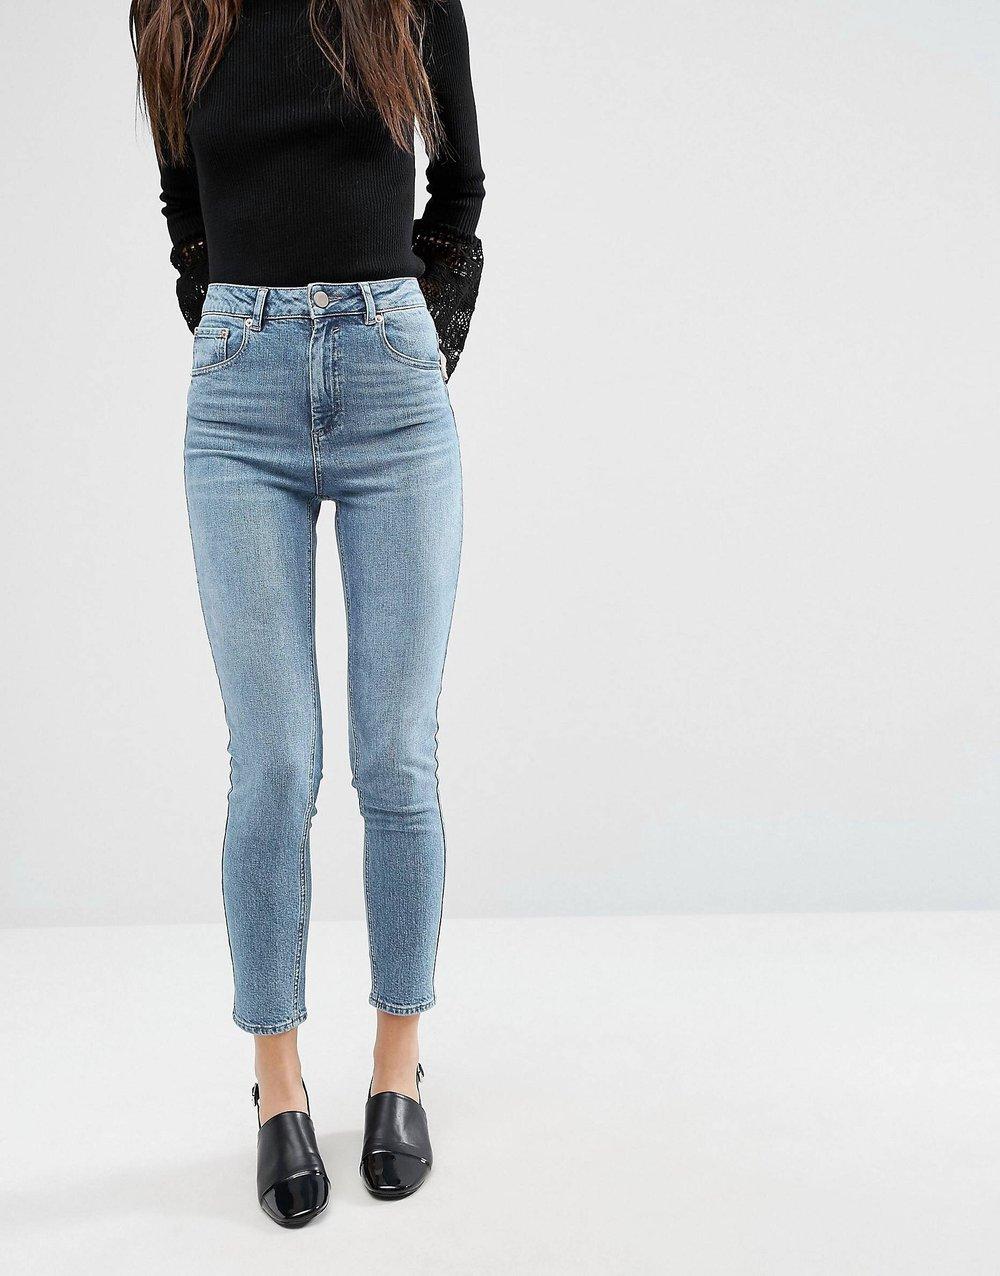 Mom Jeans 6.jpg